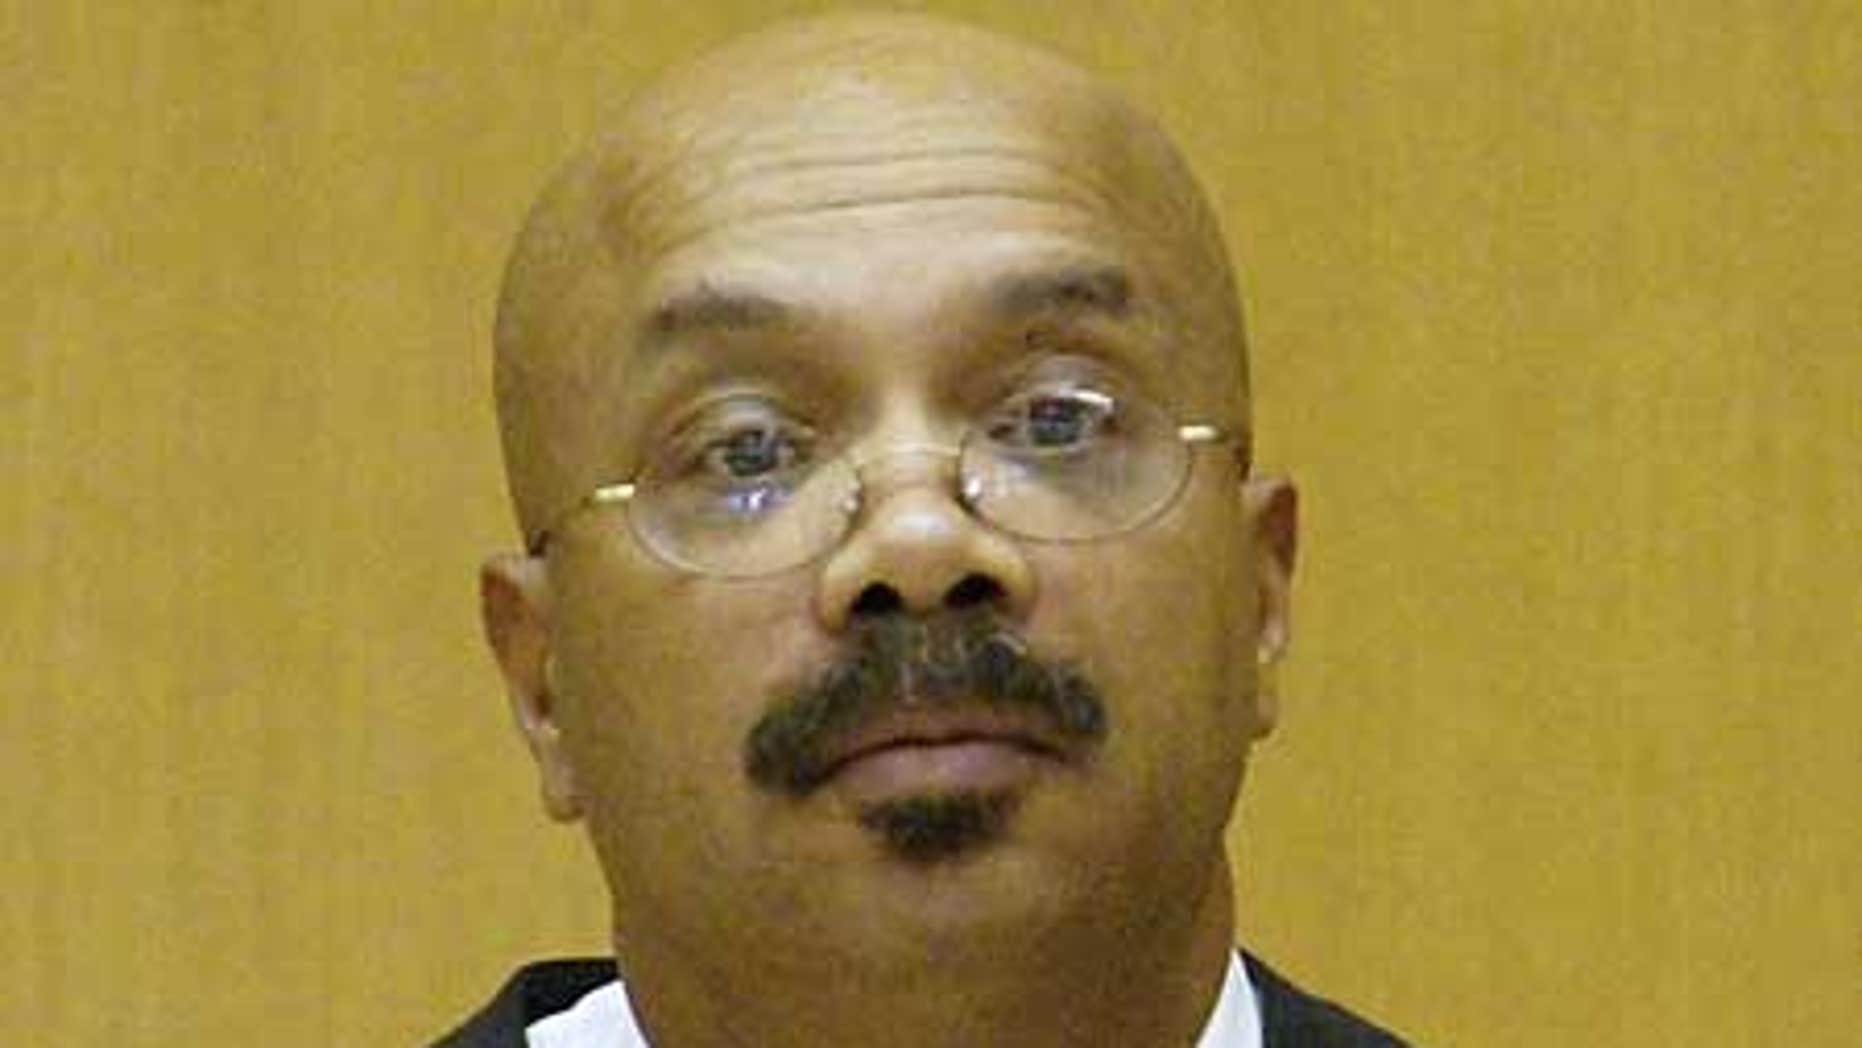 File photo of Circuit Judge Herman Thomas is shown in Mobile, Ala.